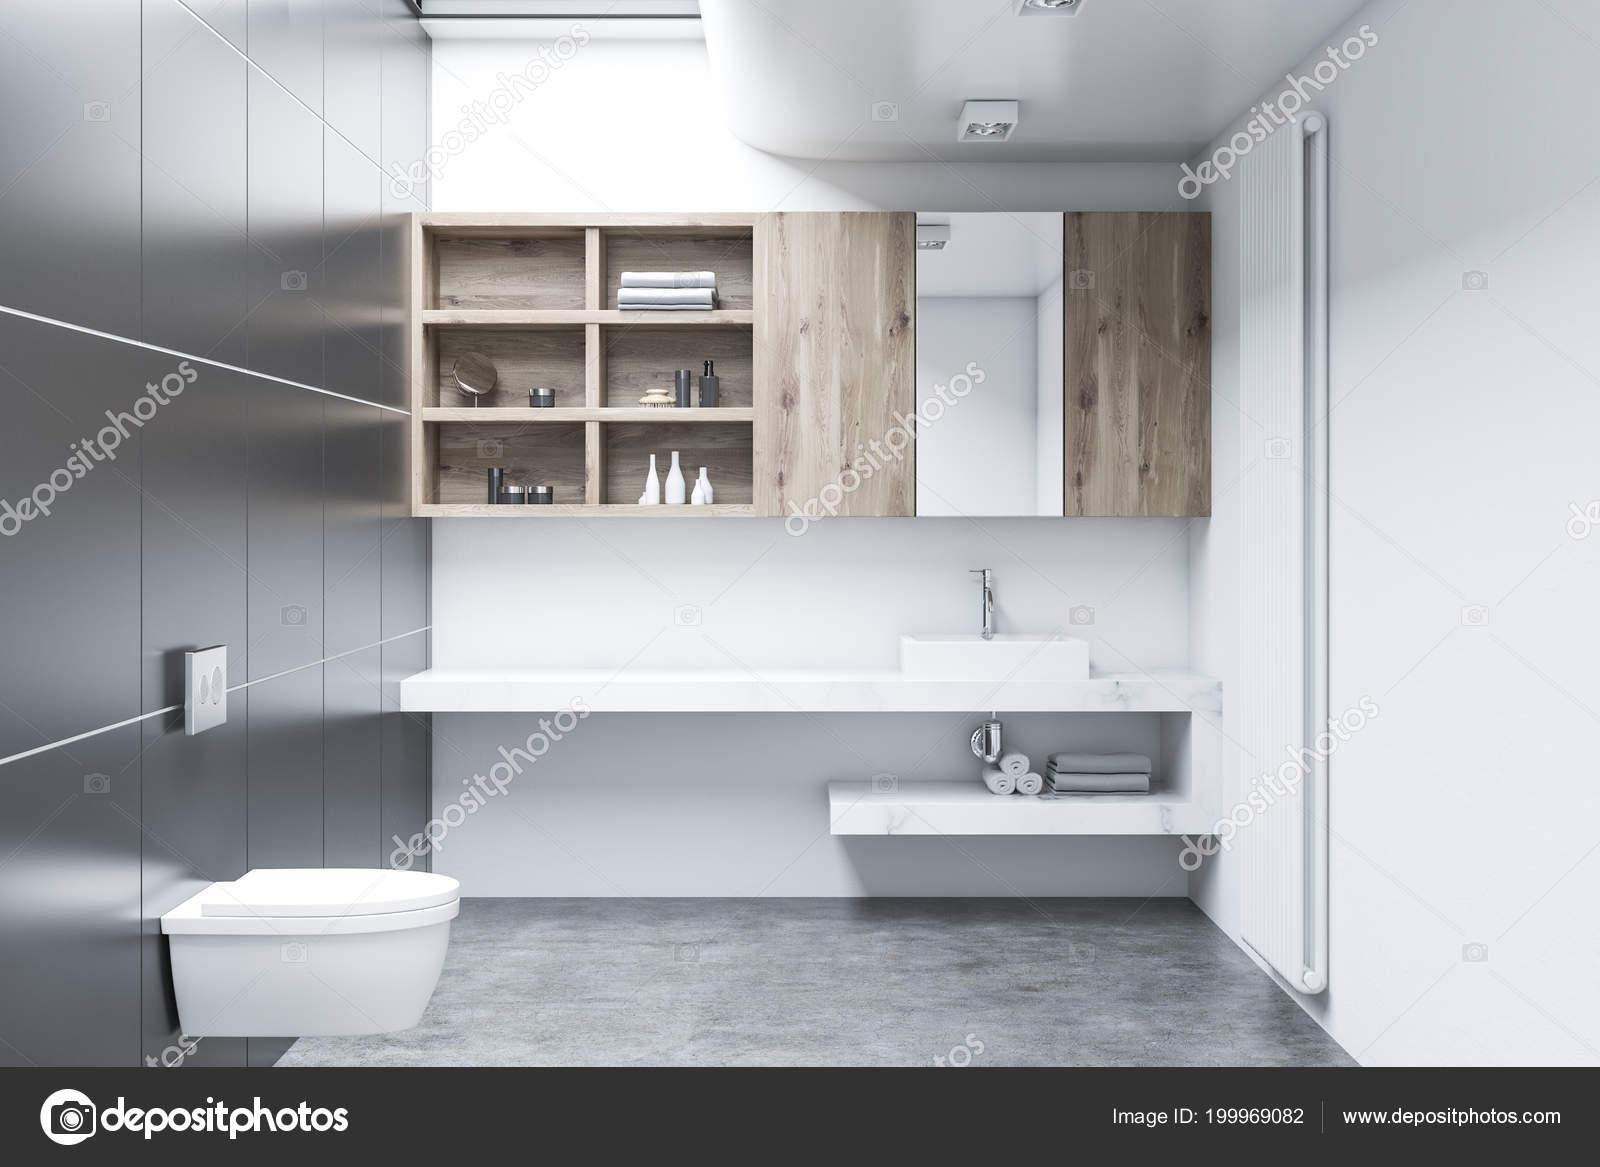 Pavimento Bianco Grigio : Interni lavabo bianco grigio con pavimento cemento doppio lavabo